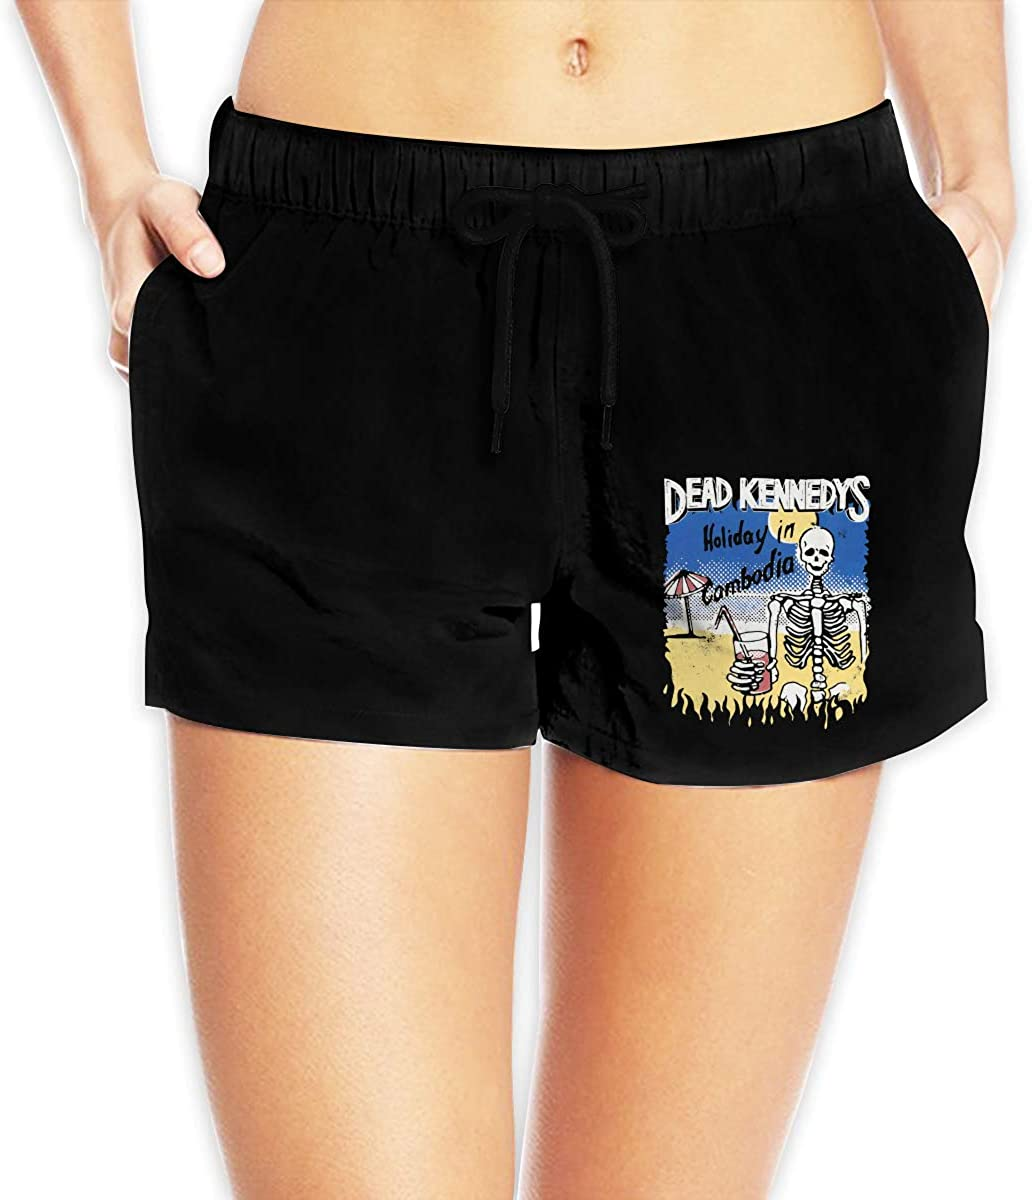 Women Sexy Hot Pants Summer Casual Shorts Dead Kennedys Short Beach Trousers